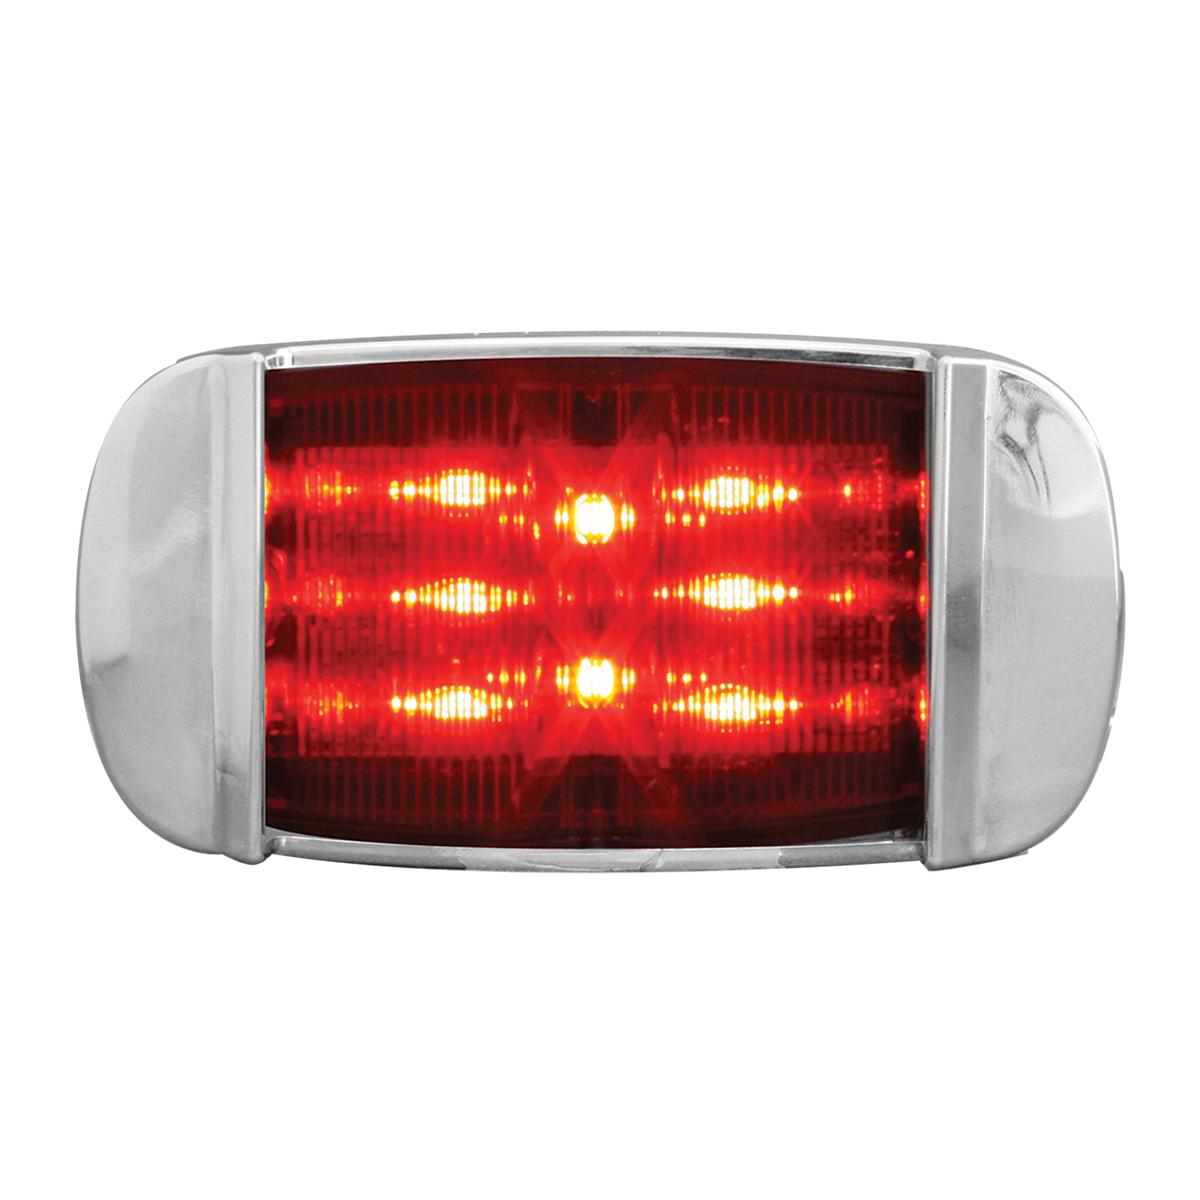 76256 Rectangular Camel Back Wide Angle LED Marker Light w/ Chrome Bezel